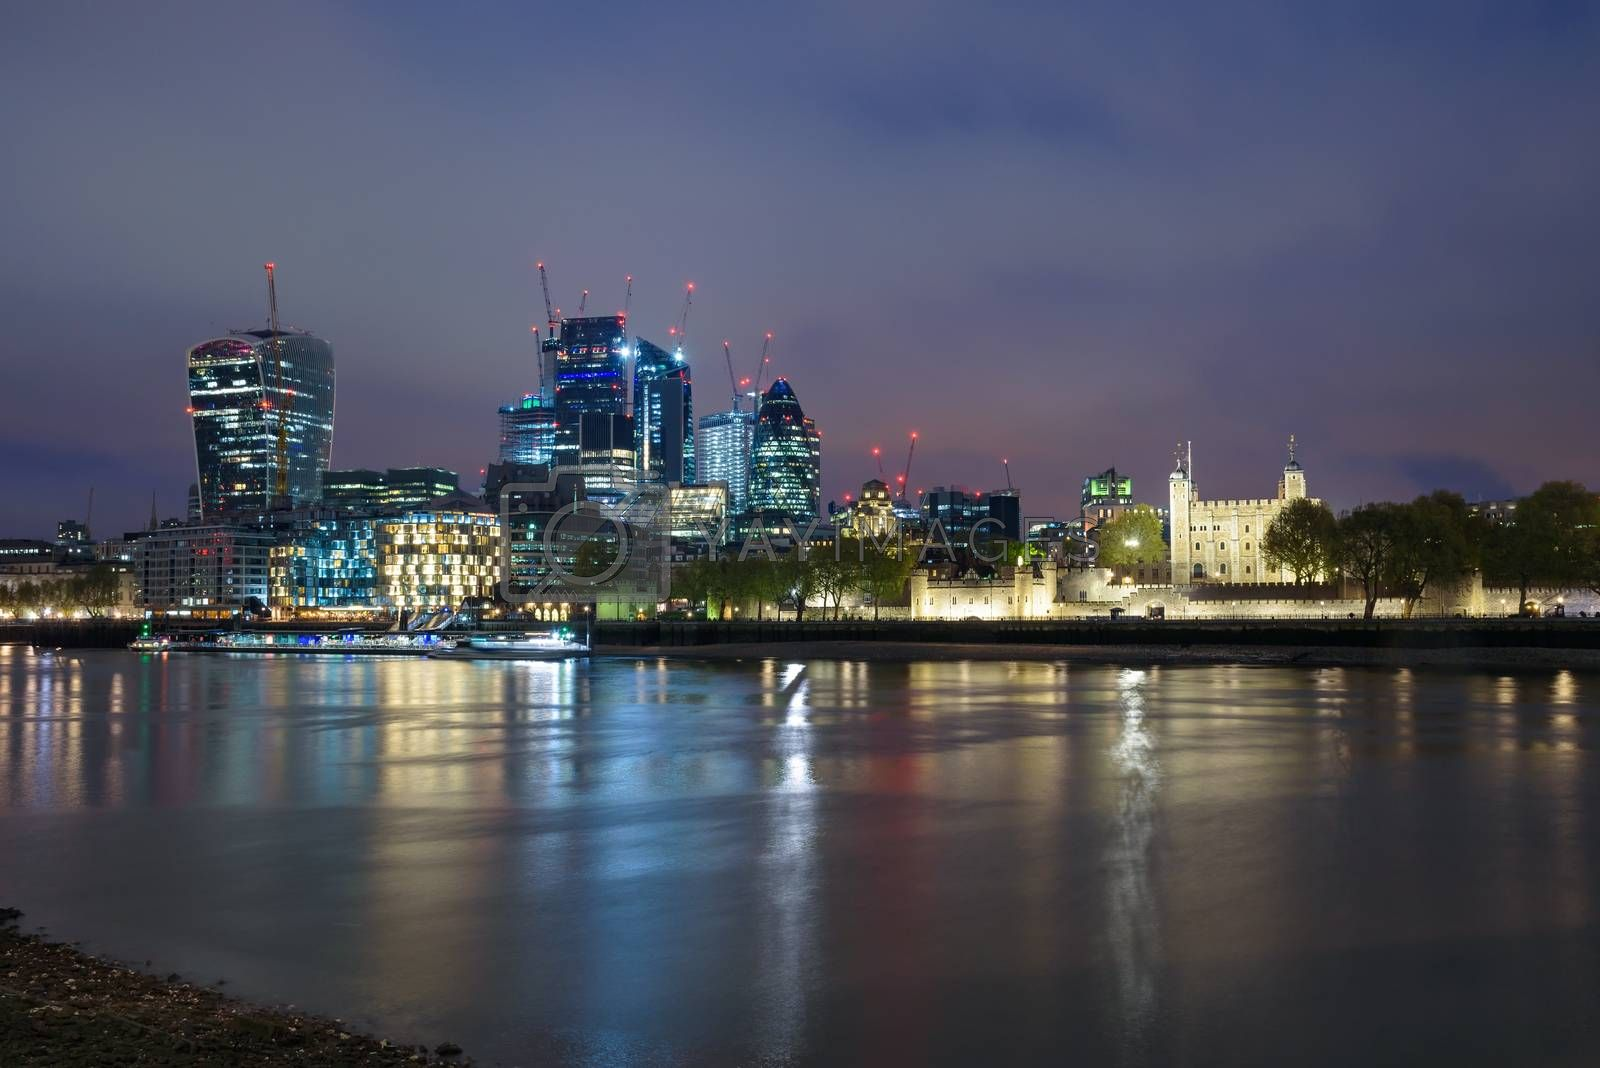 Colorful London skyline at cloudy night, United Kingdom